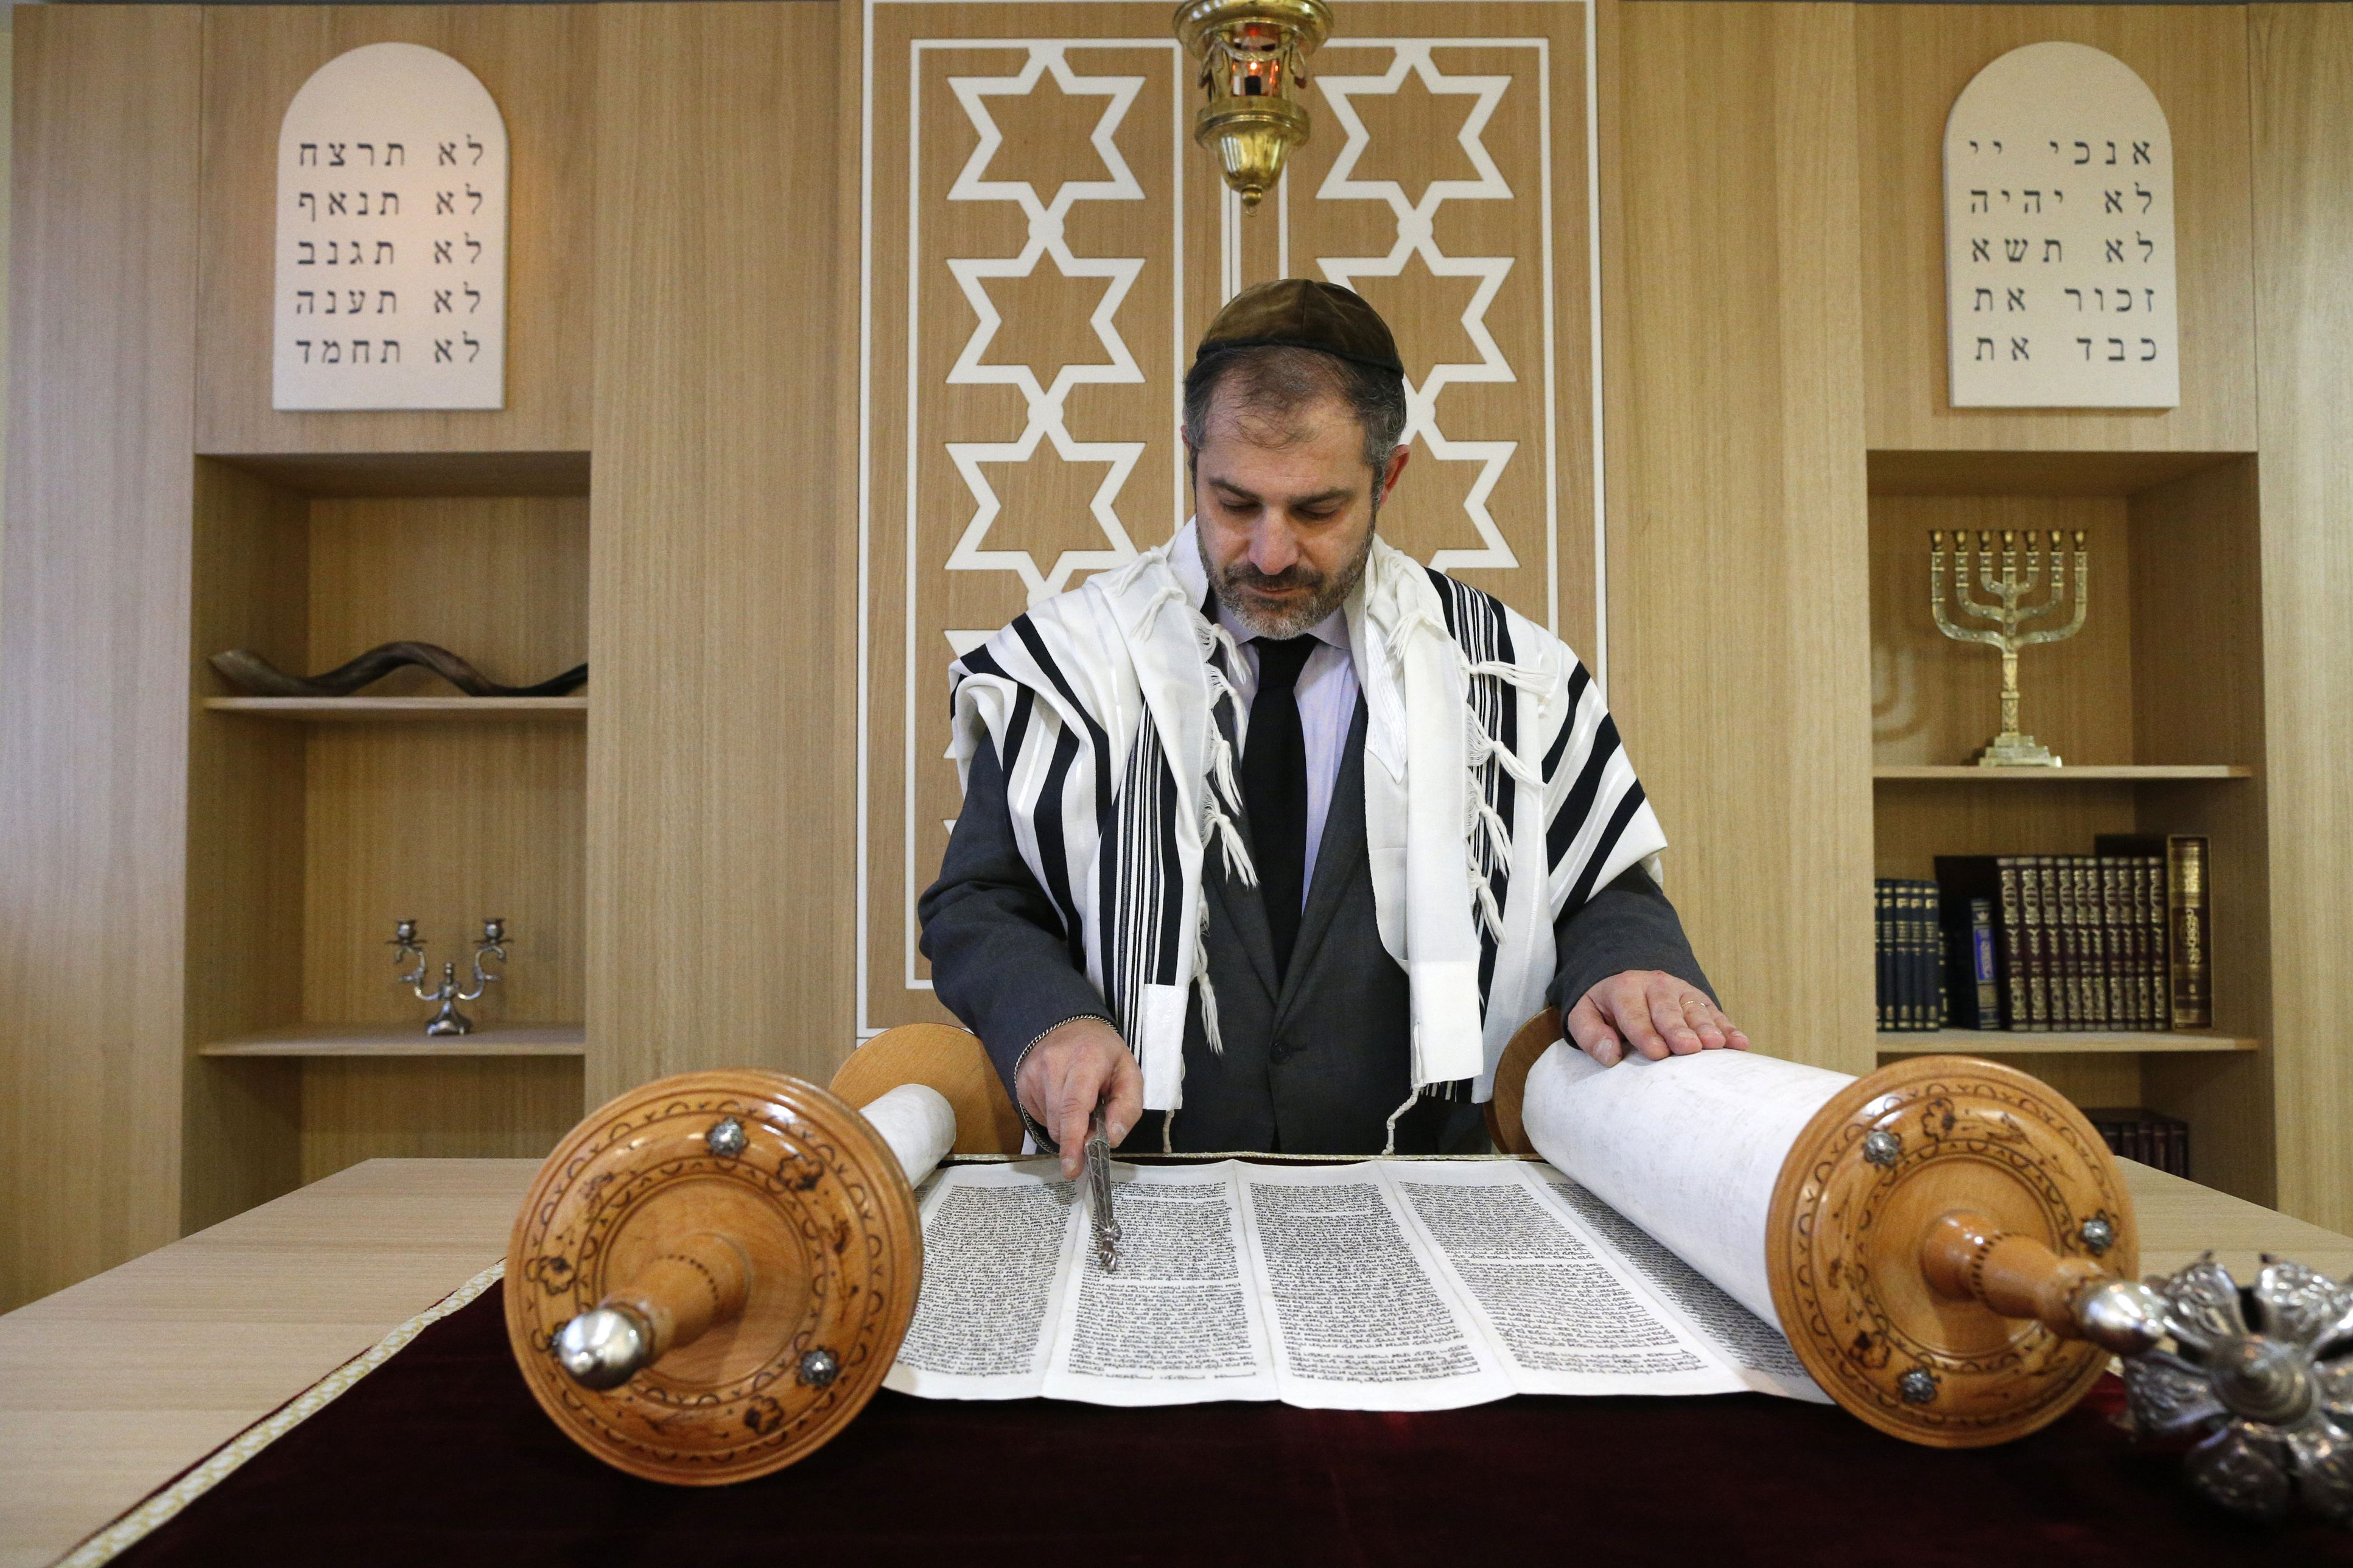 Rabbi reading of the Torah.